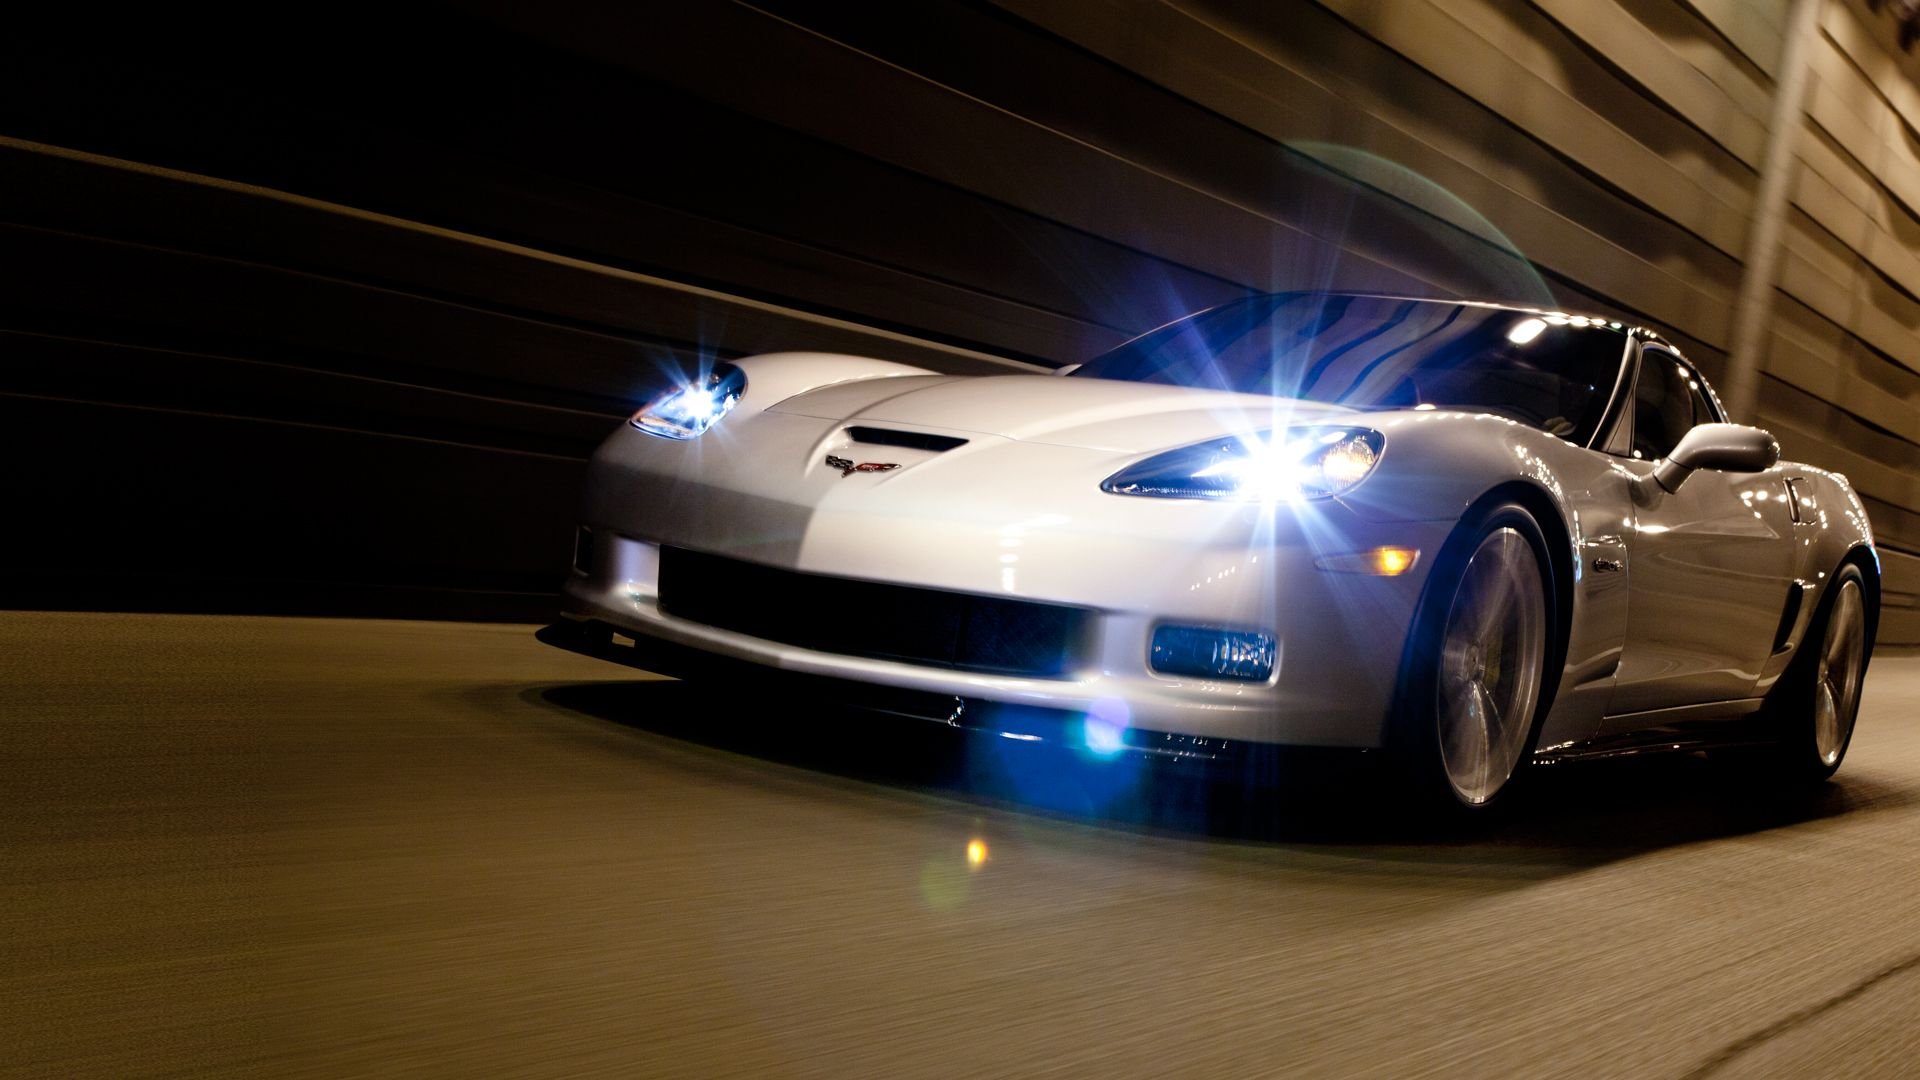 2013 Chevrolet Corvette Z06 Sports car, Chevrolet